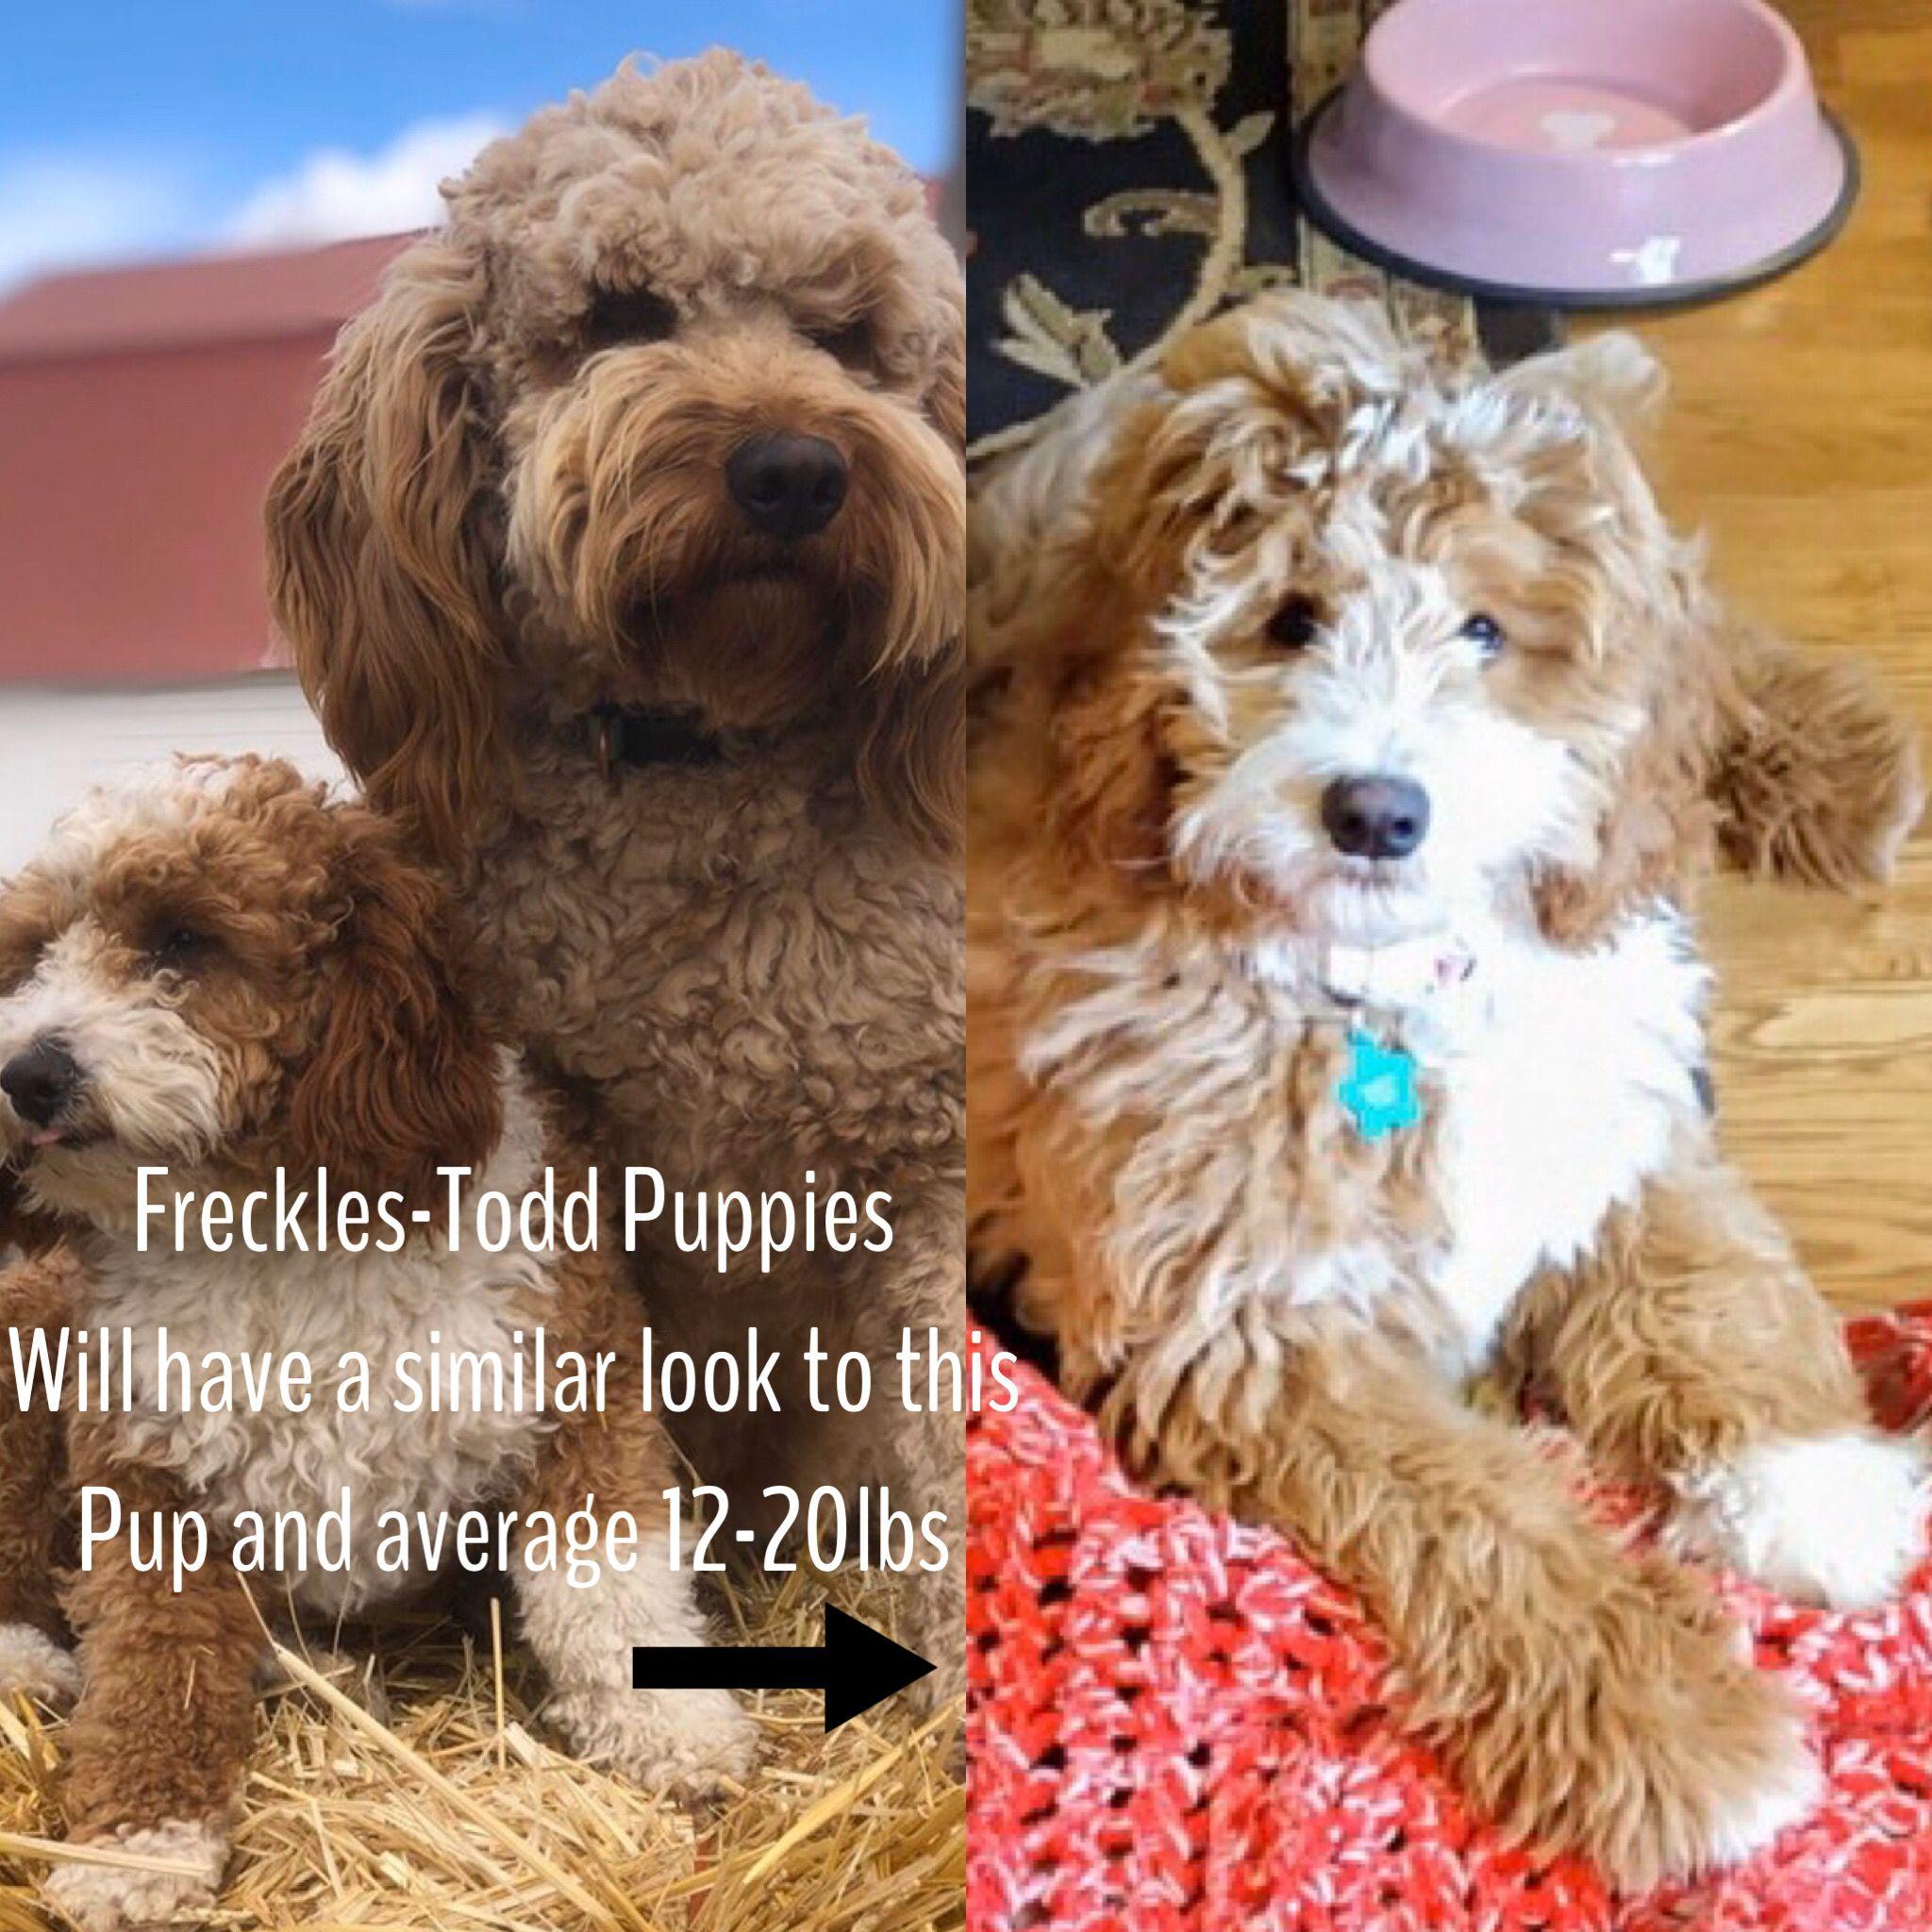 F1b Mini Goldendoodles in 2020 Puppy snuggles, Mini